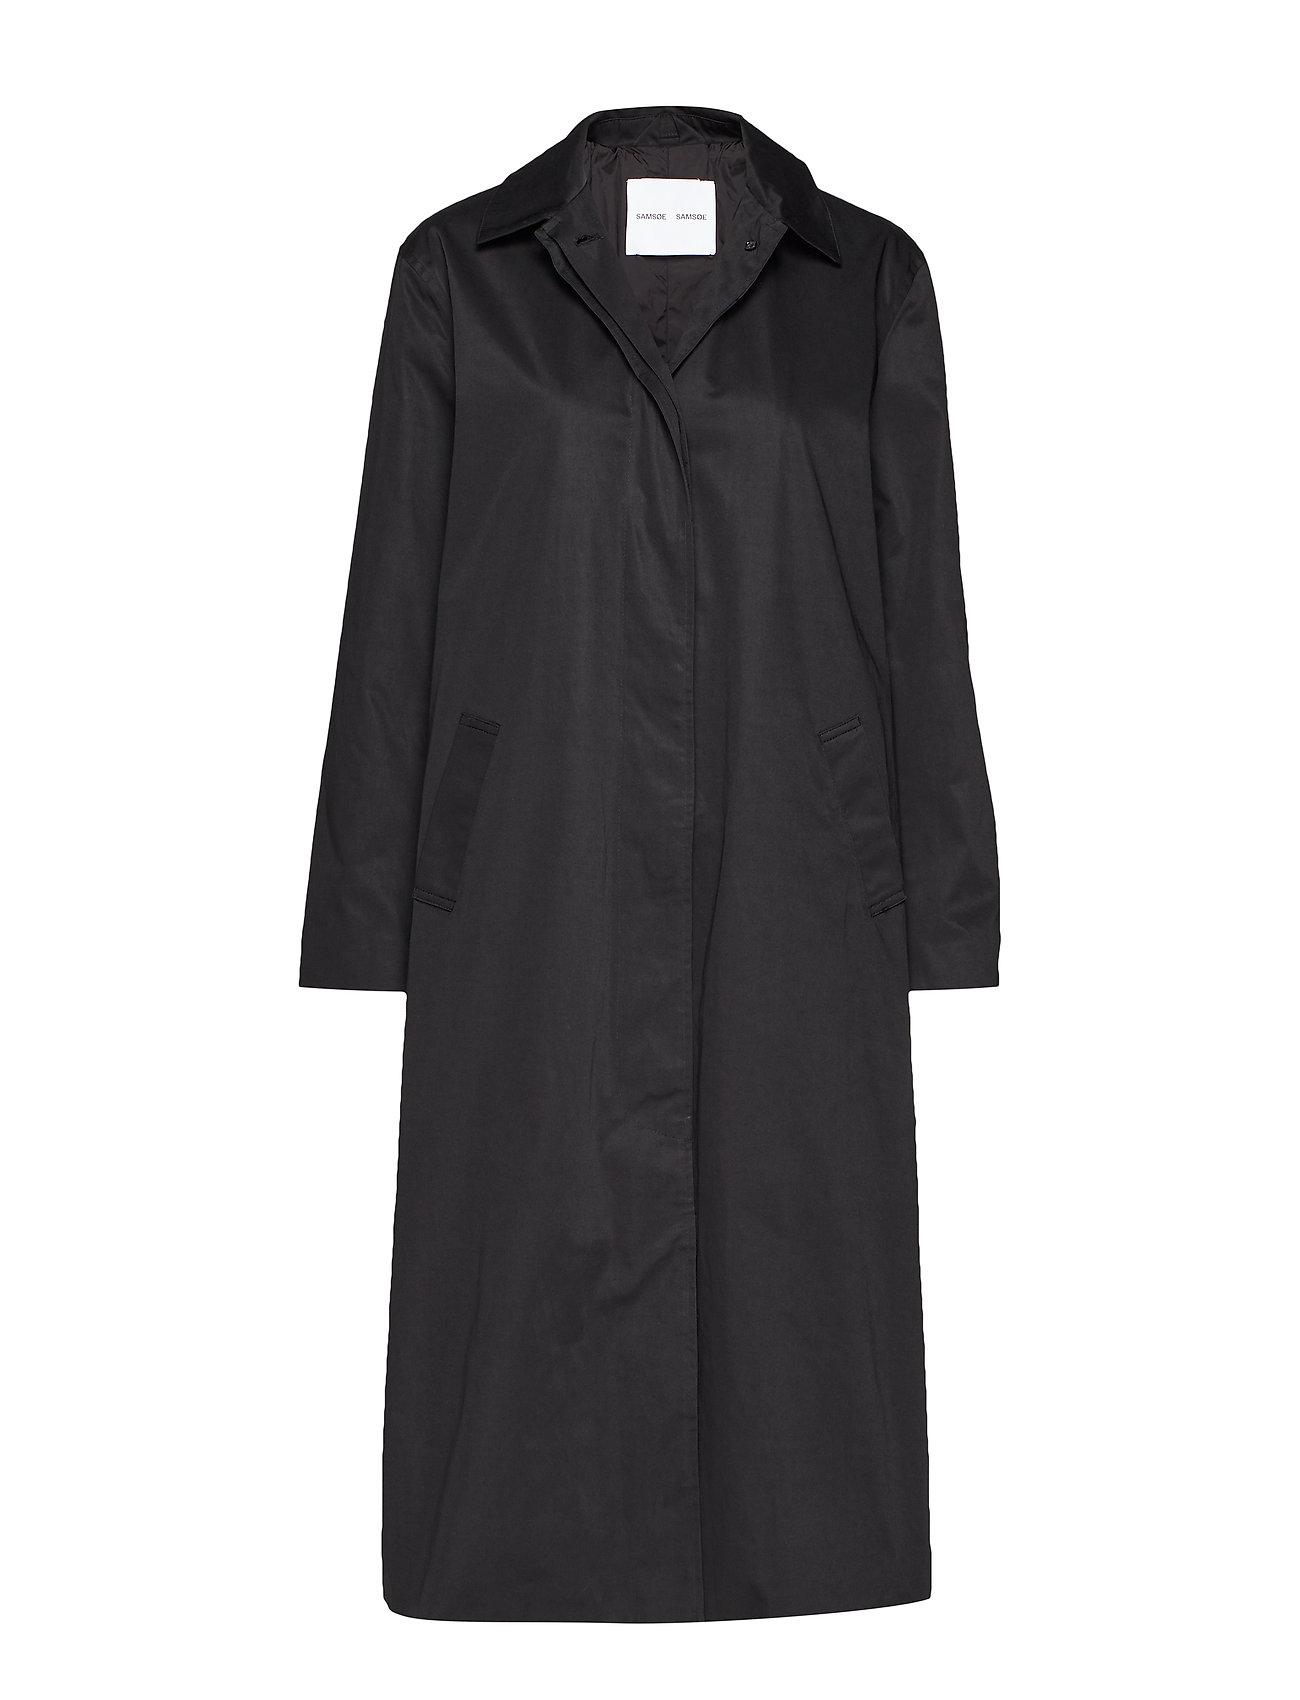 Samsøe Samsøe Minoux coat 12681 - BLACK